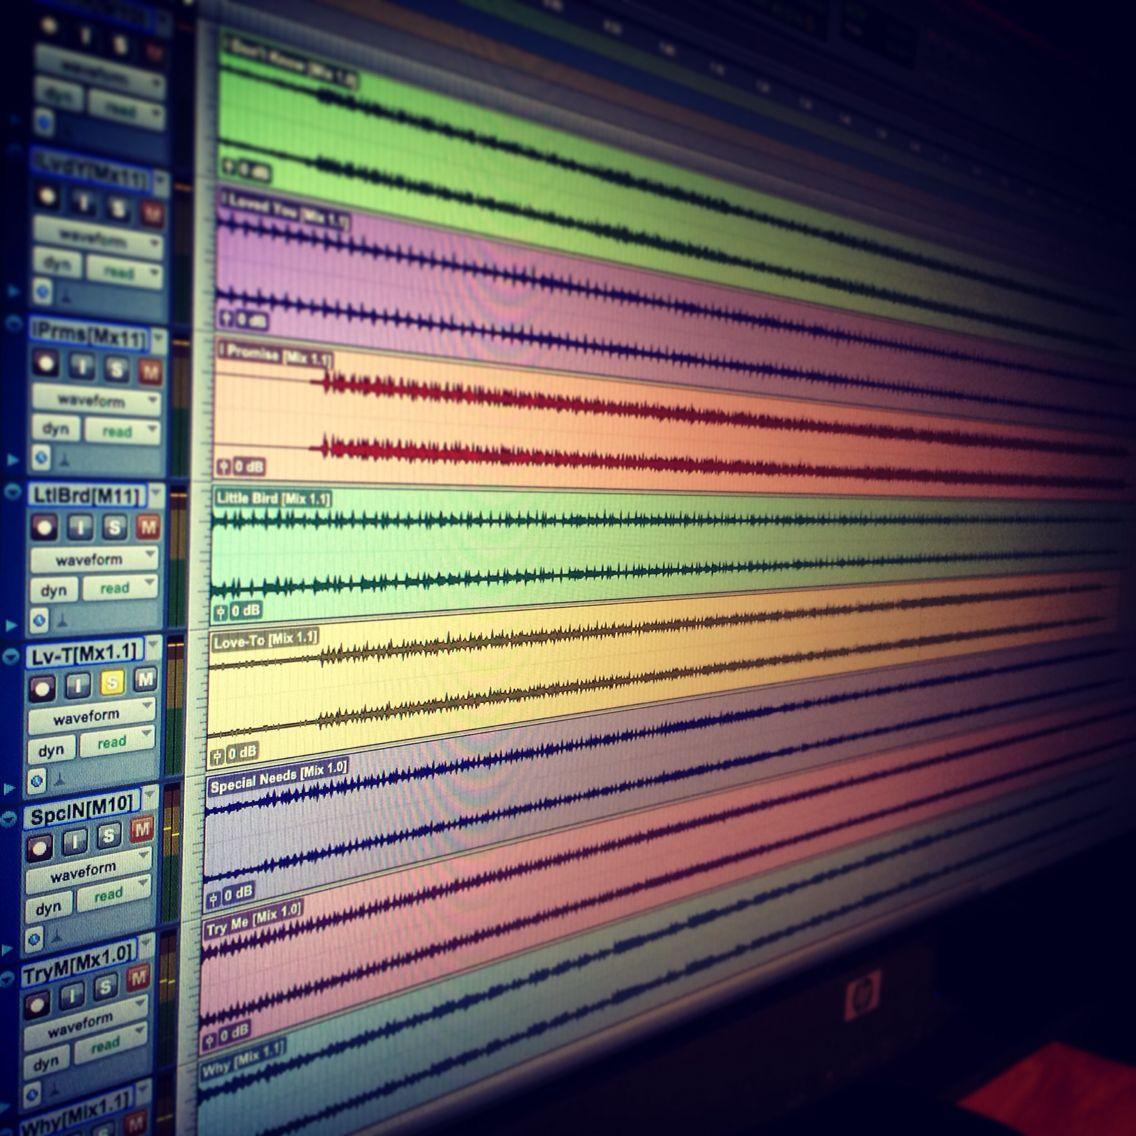 Album mastering at ATonal with Pro Tools. Pro tools